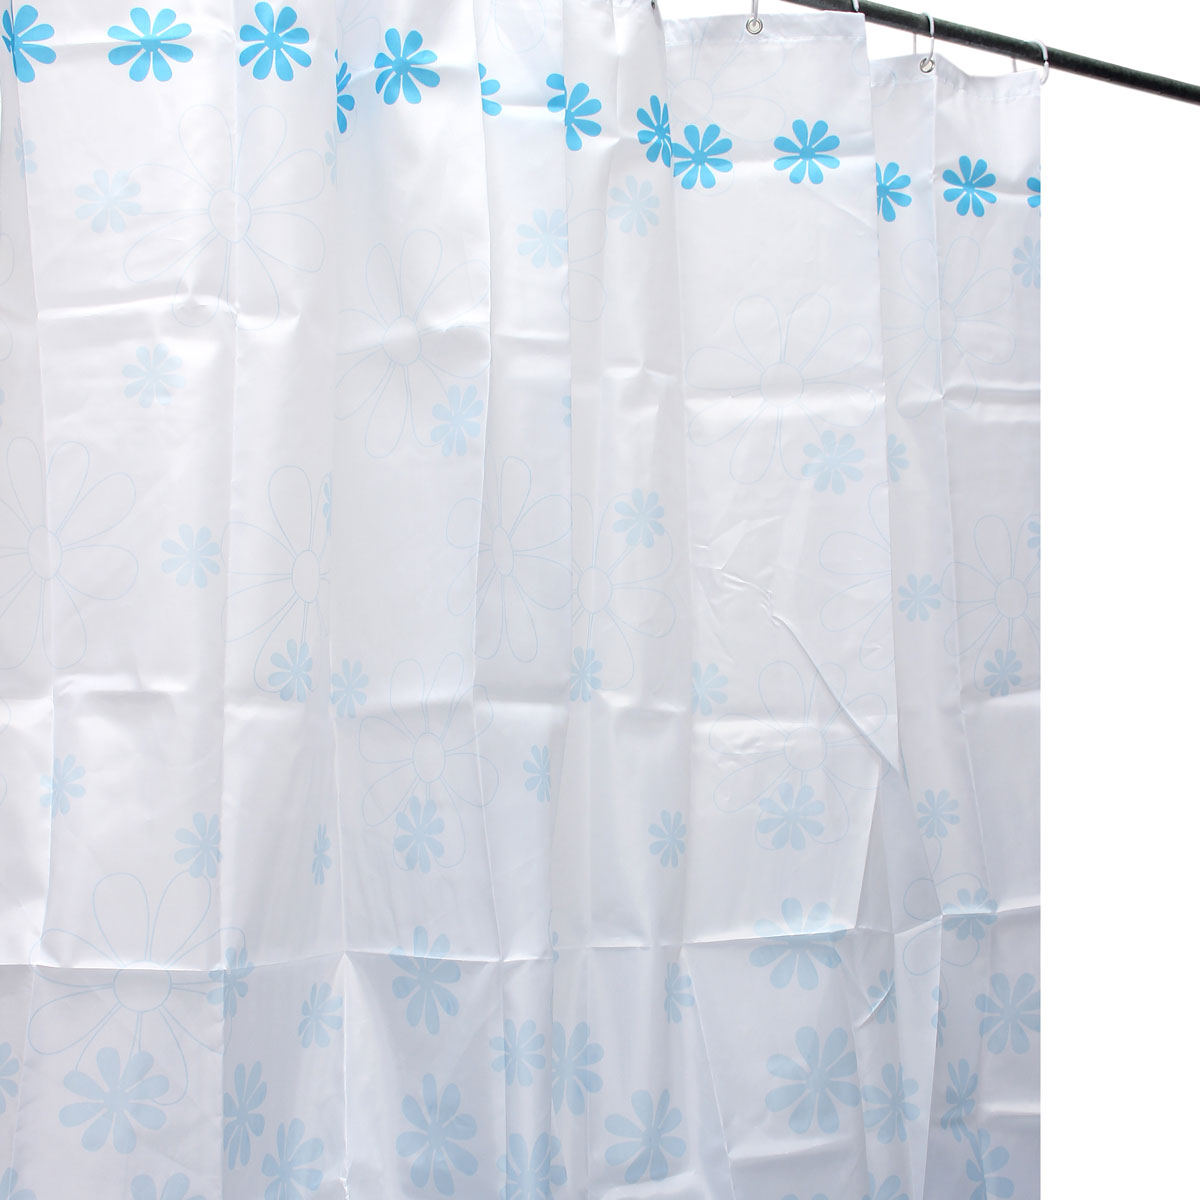 10 Style 4size Polyester Fibre Waterproof Bathroom Shower Curtain W Hooks Set Ebay